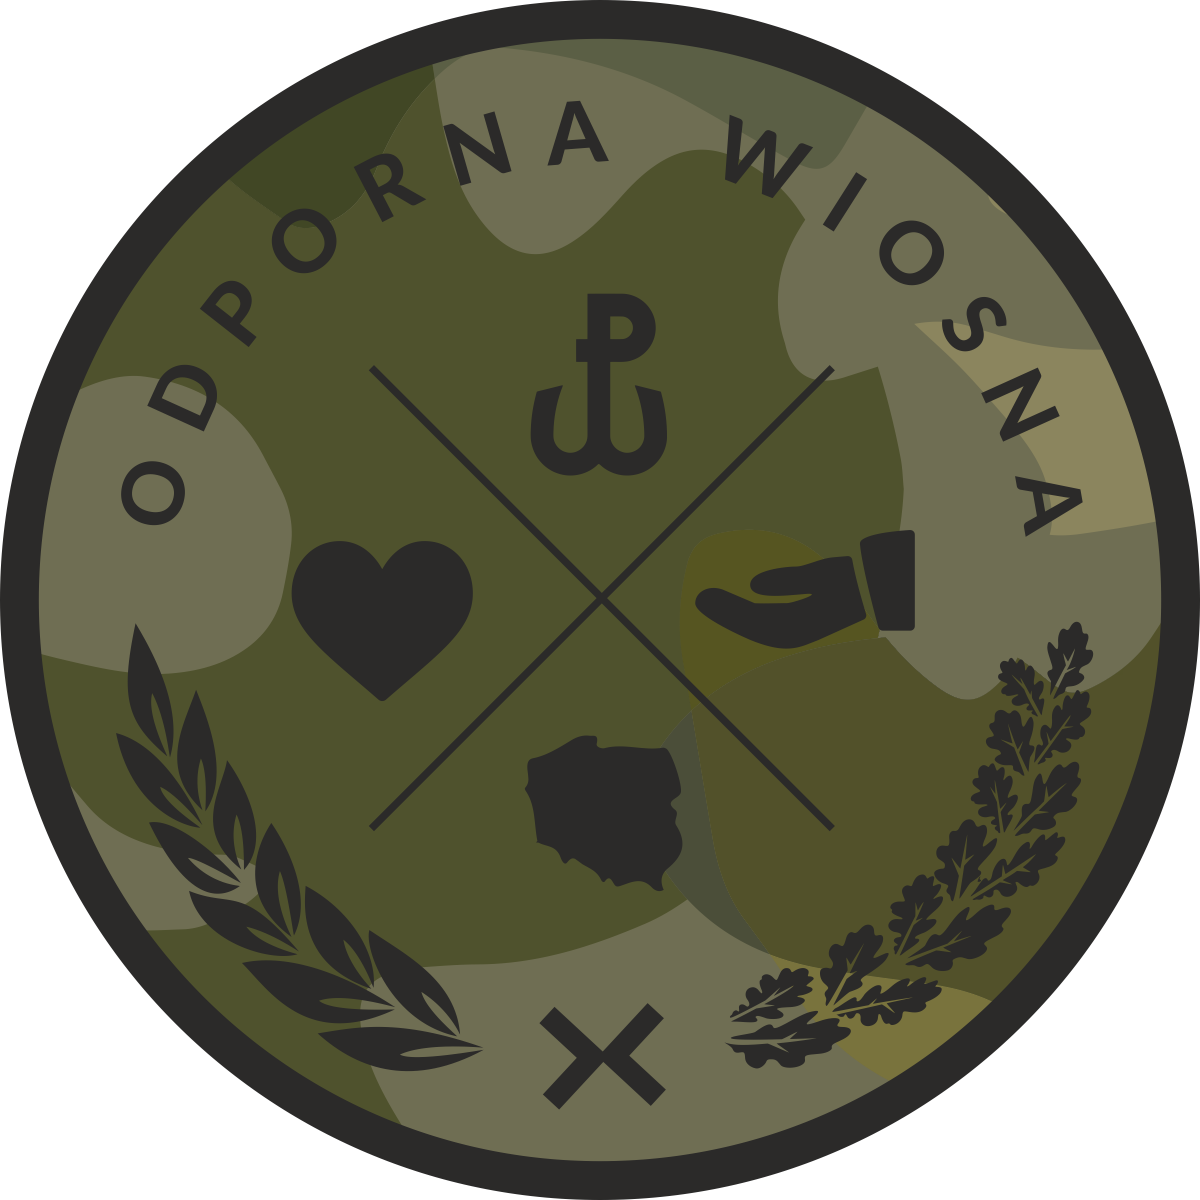 http://m.wm.pl/2020/03/orig/0000009688-logo-1-619495.jpg